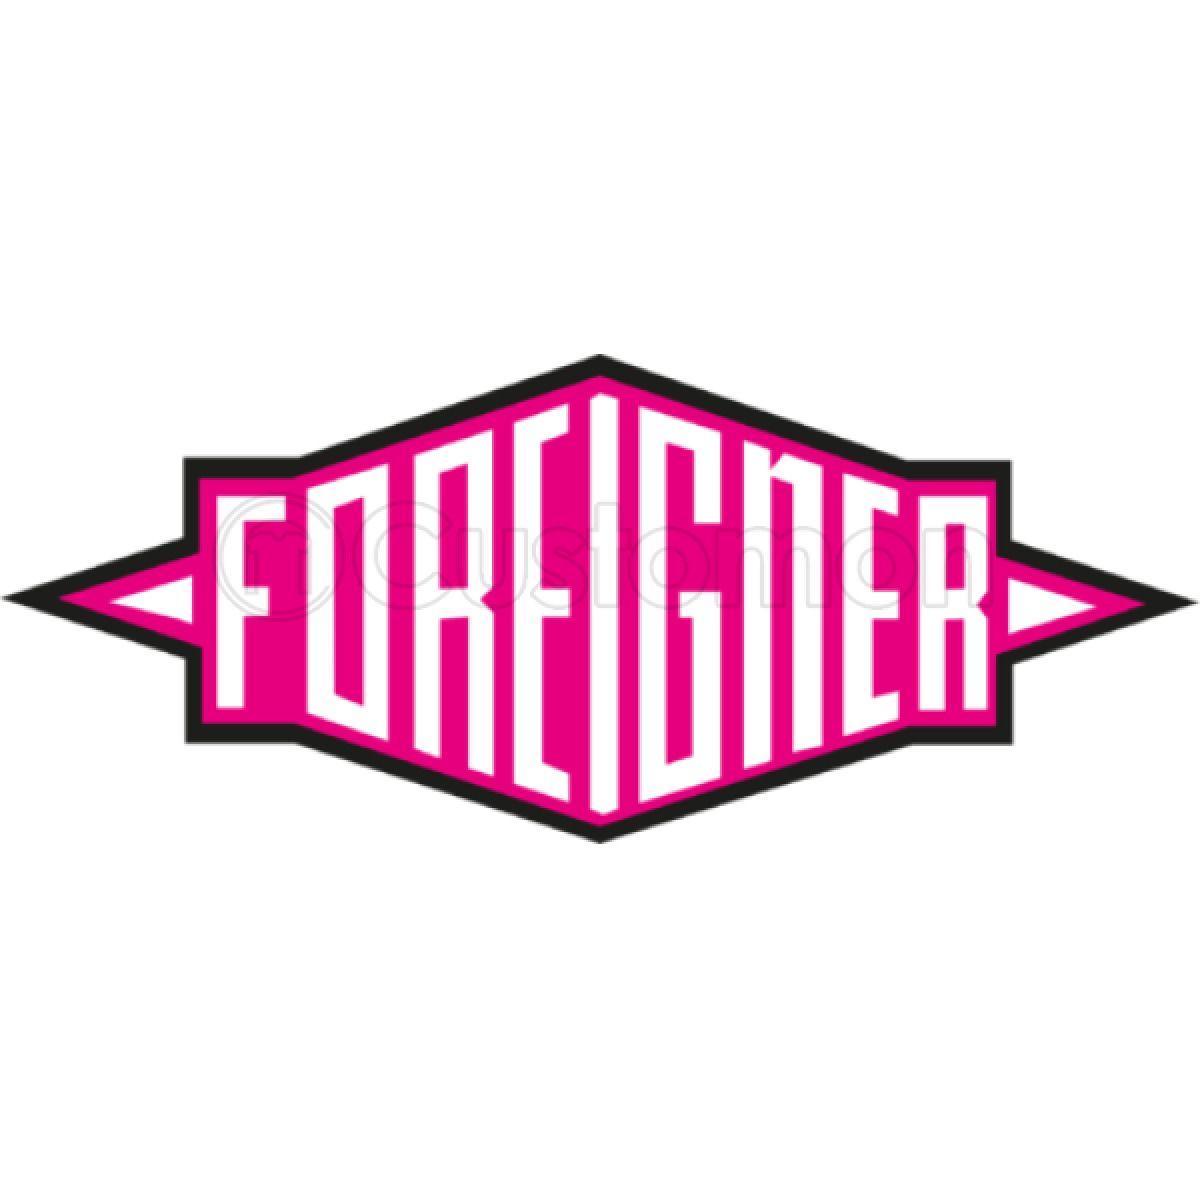 Foreigner Band Quotes. QuotesGram |Foreigner Logo